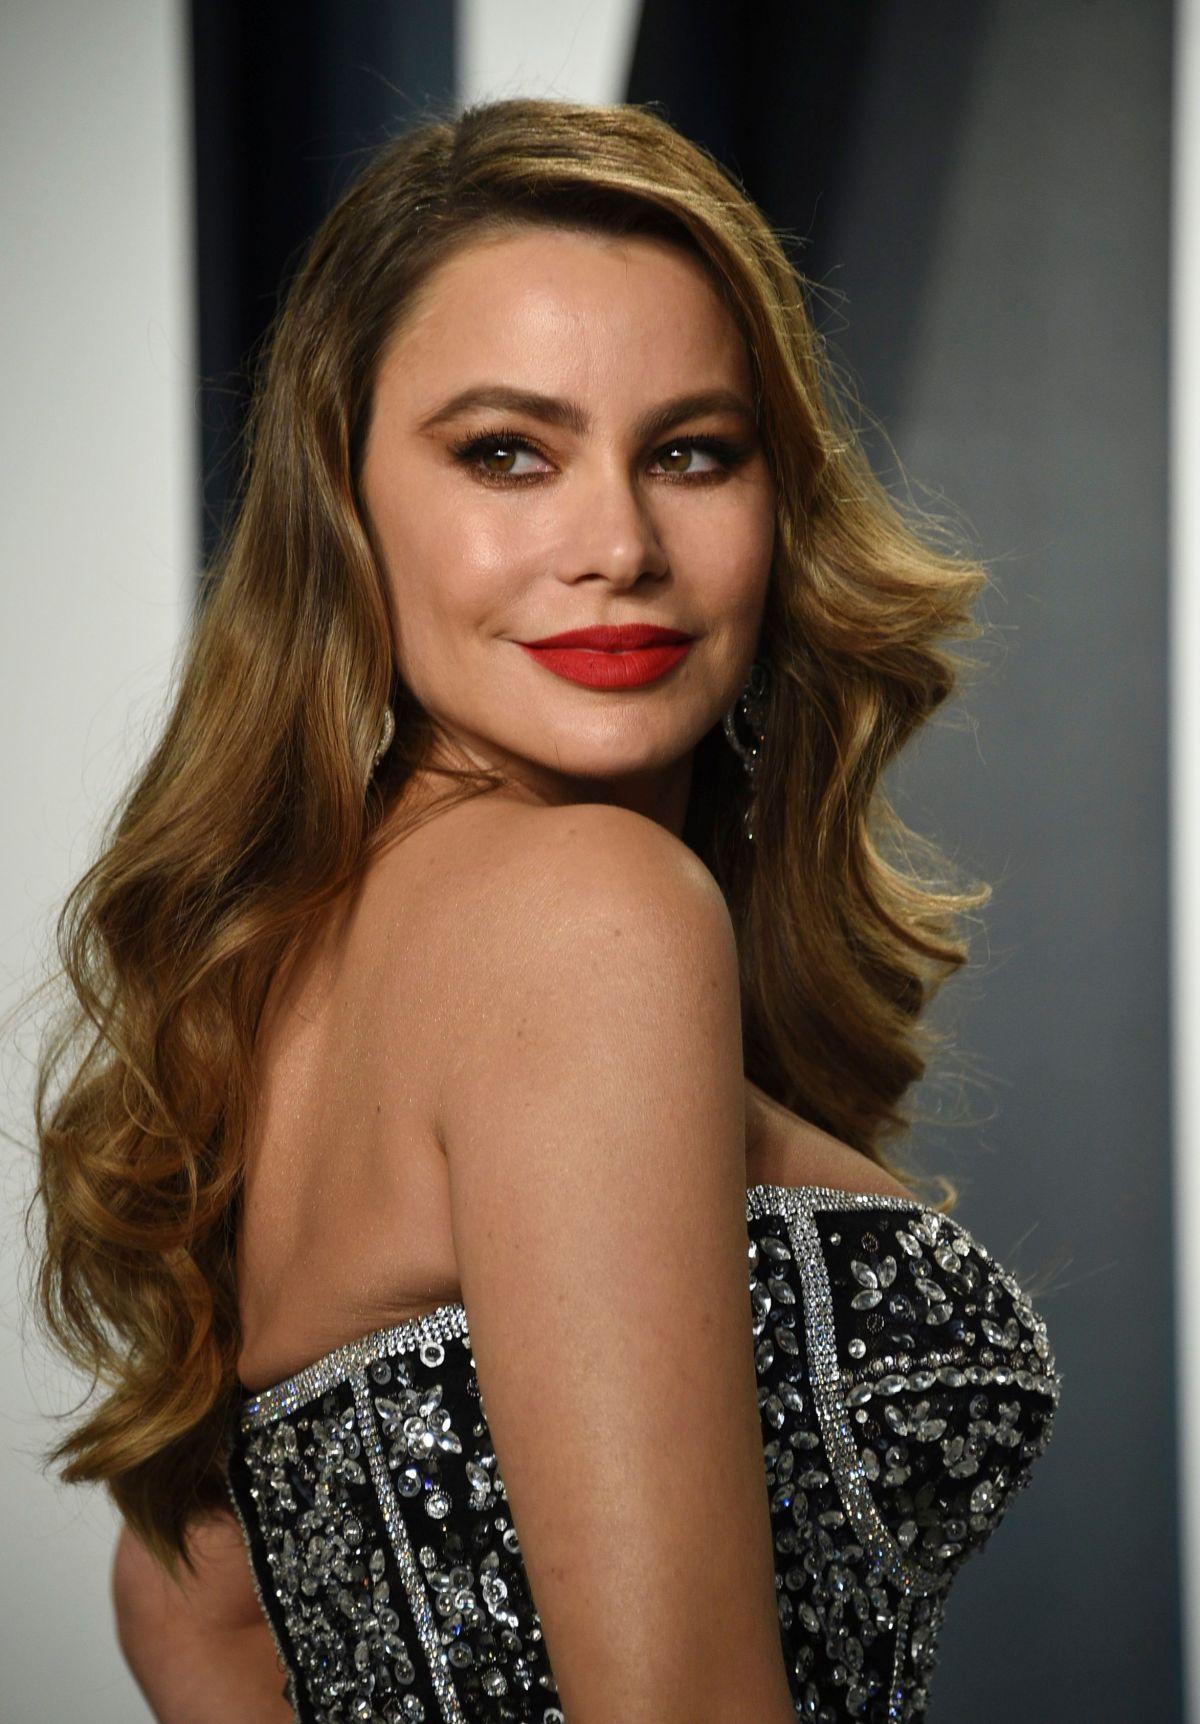 SOFIA VERGARA At Vanity Fair Oscar Party In Beverly Hills